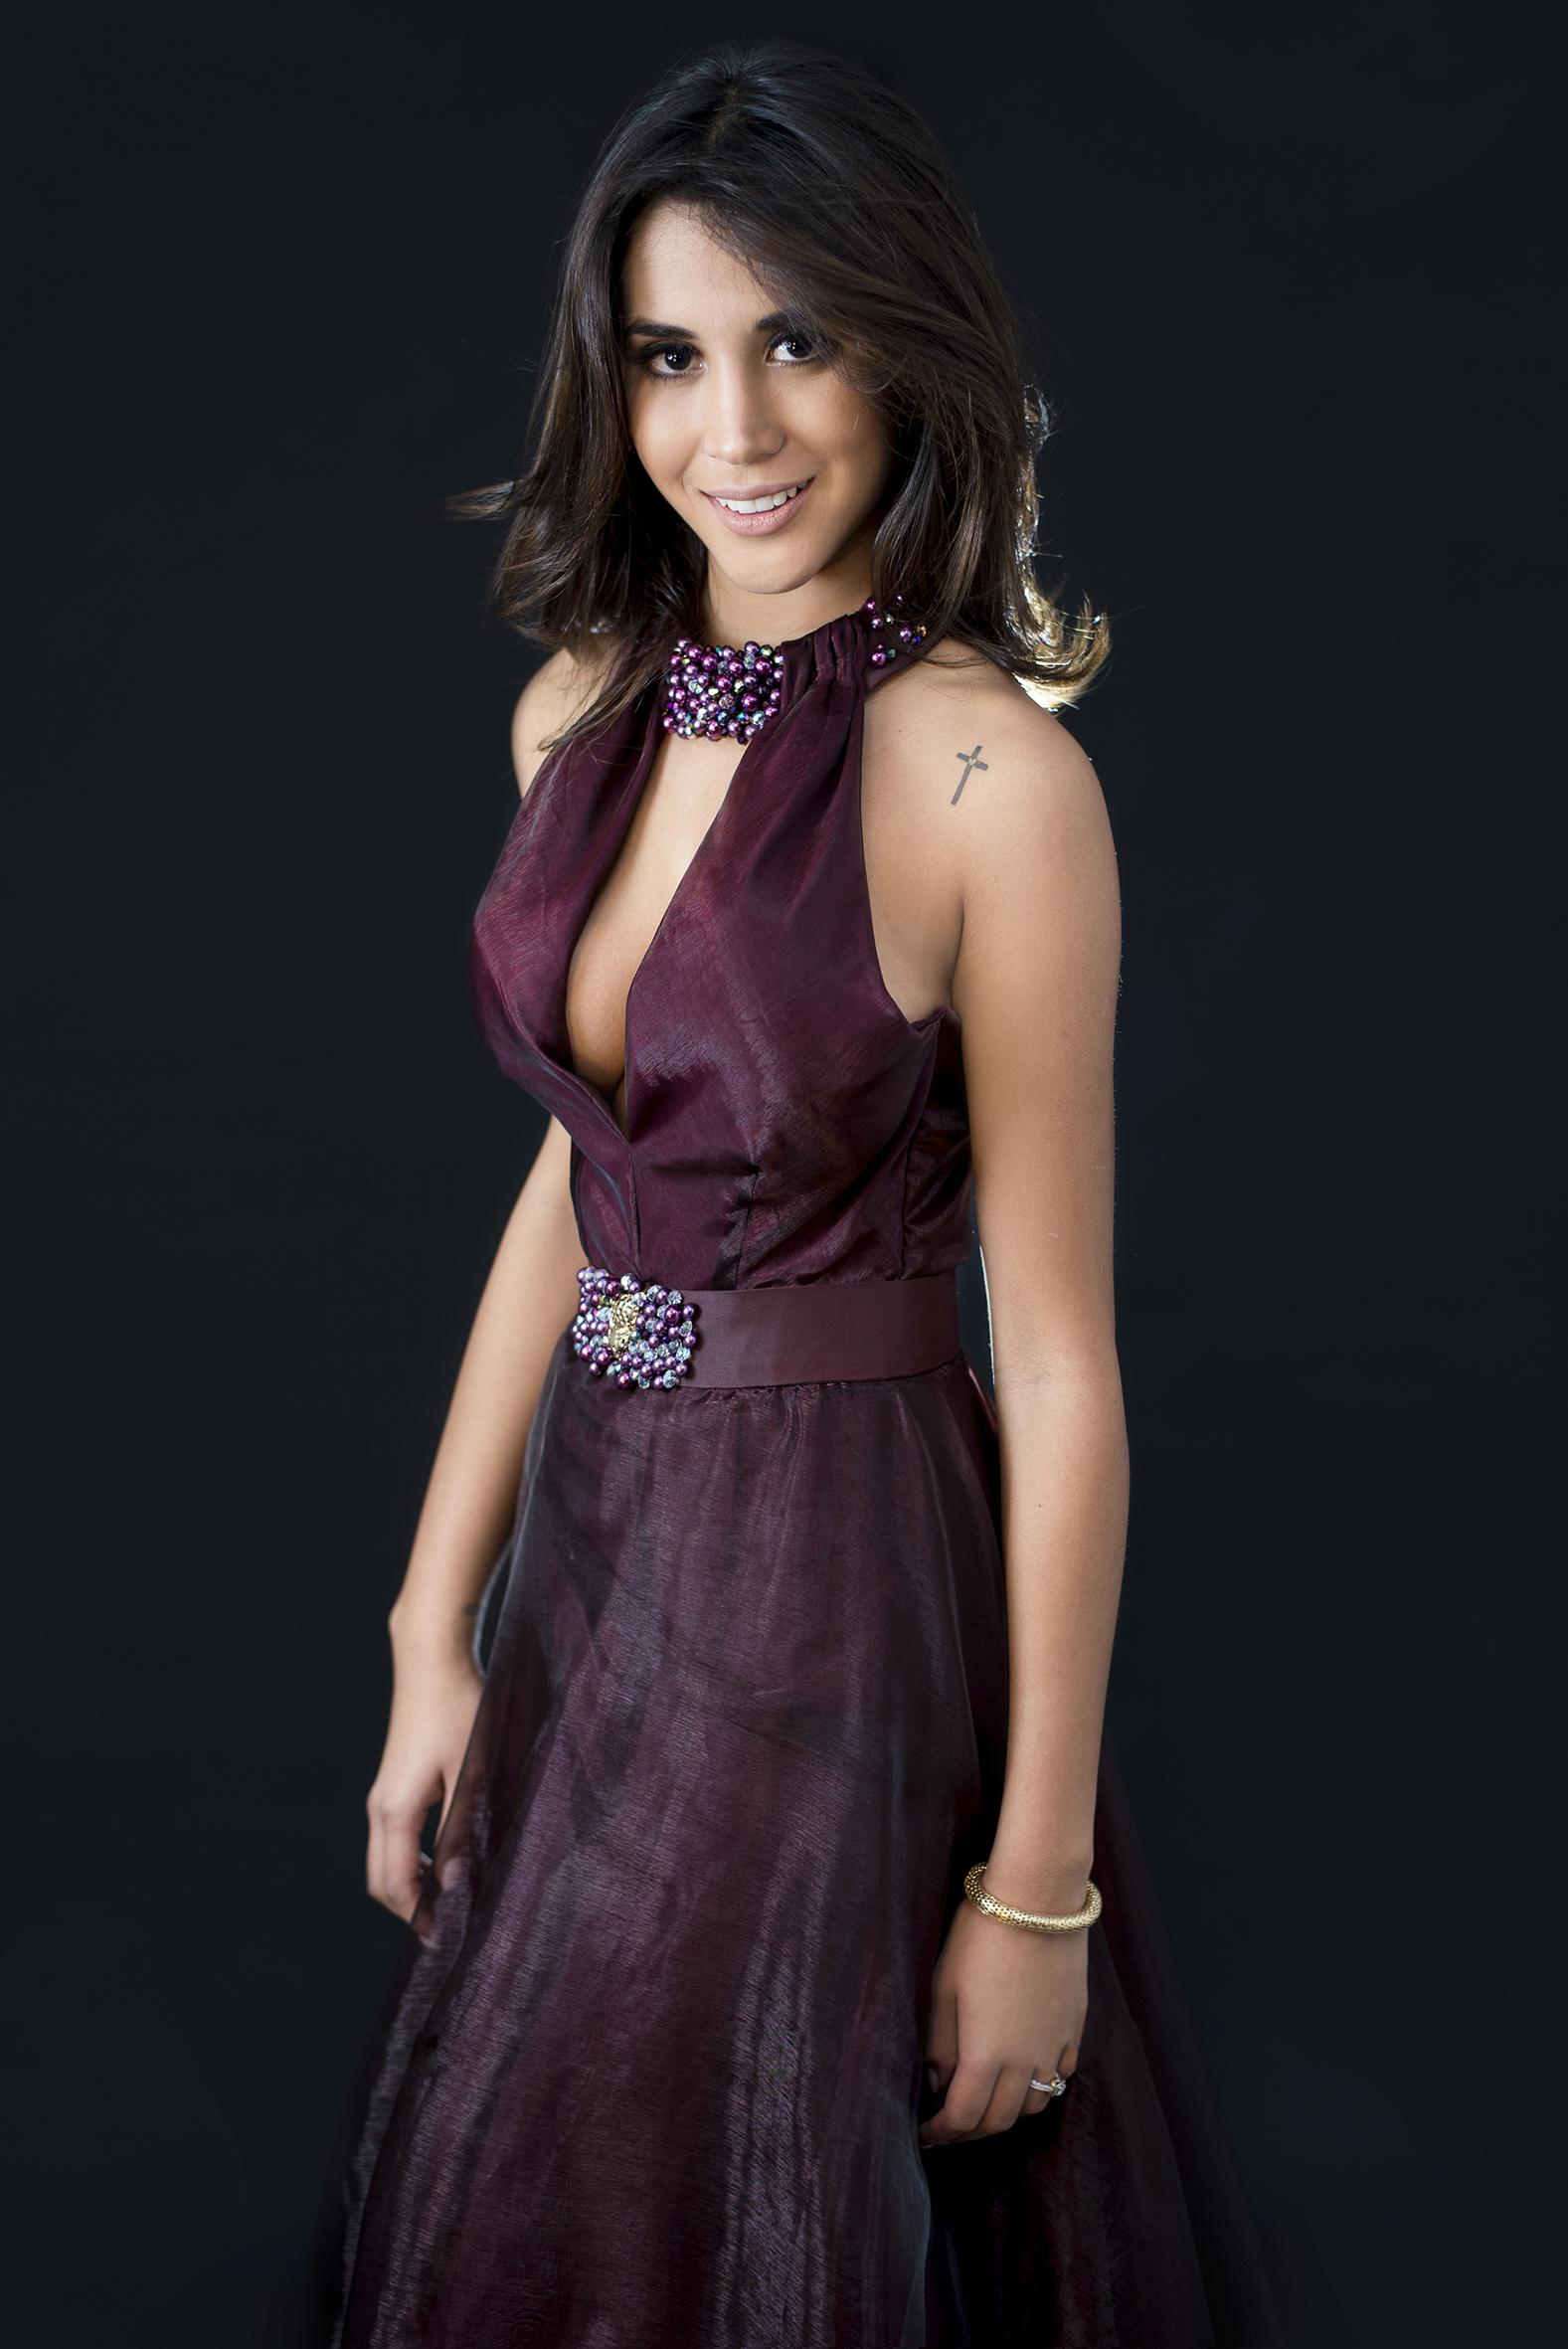 Melissa Paredes Superhype Agosto America TV- 003.jpg